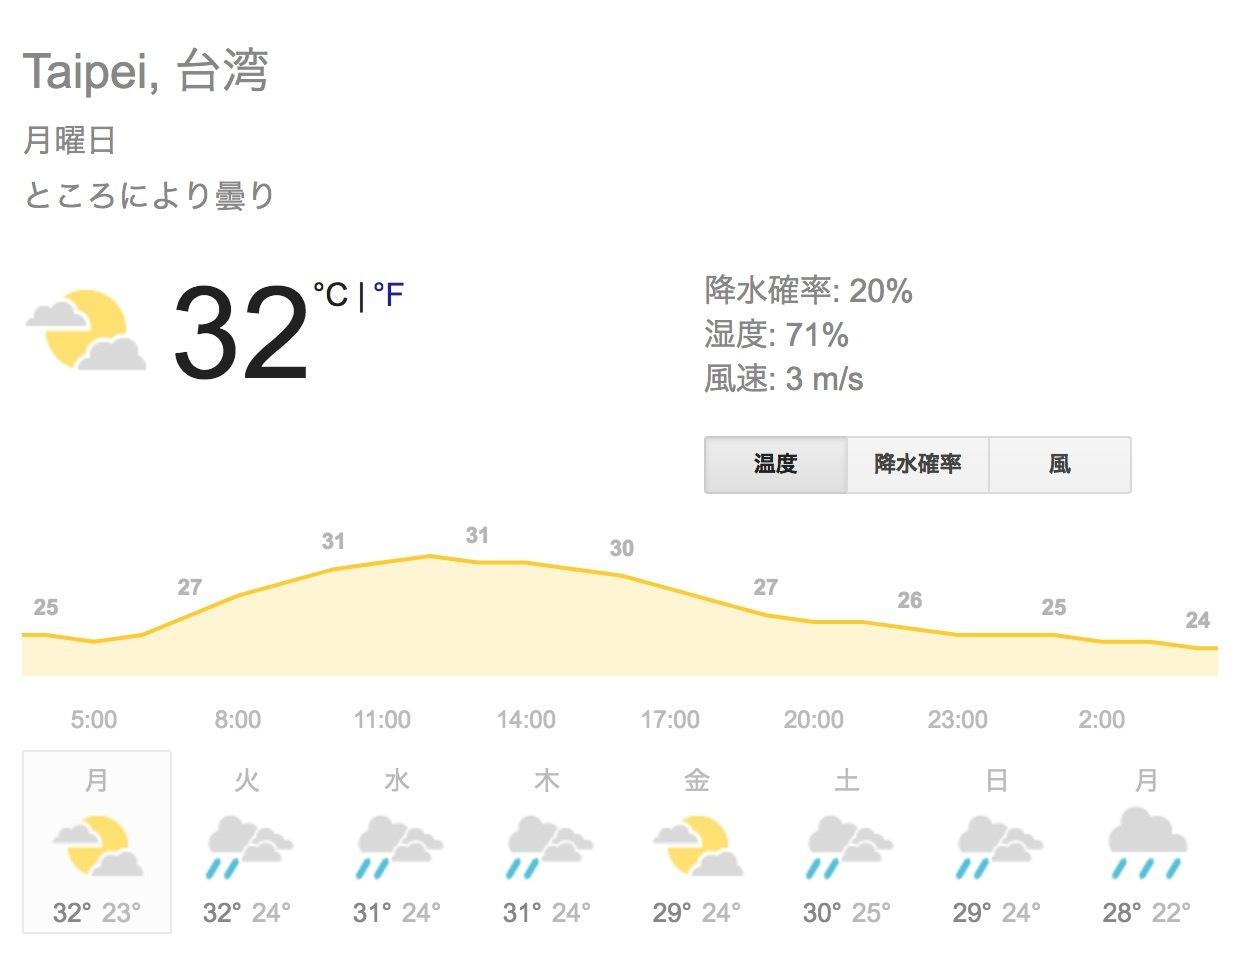 Hanaの台湾レポート2019〜その2〜「太陽神」オレってすごい?_a0037910_05433742.jpg